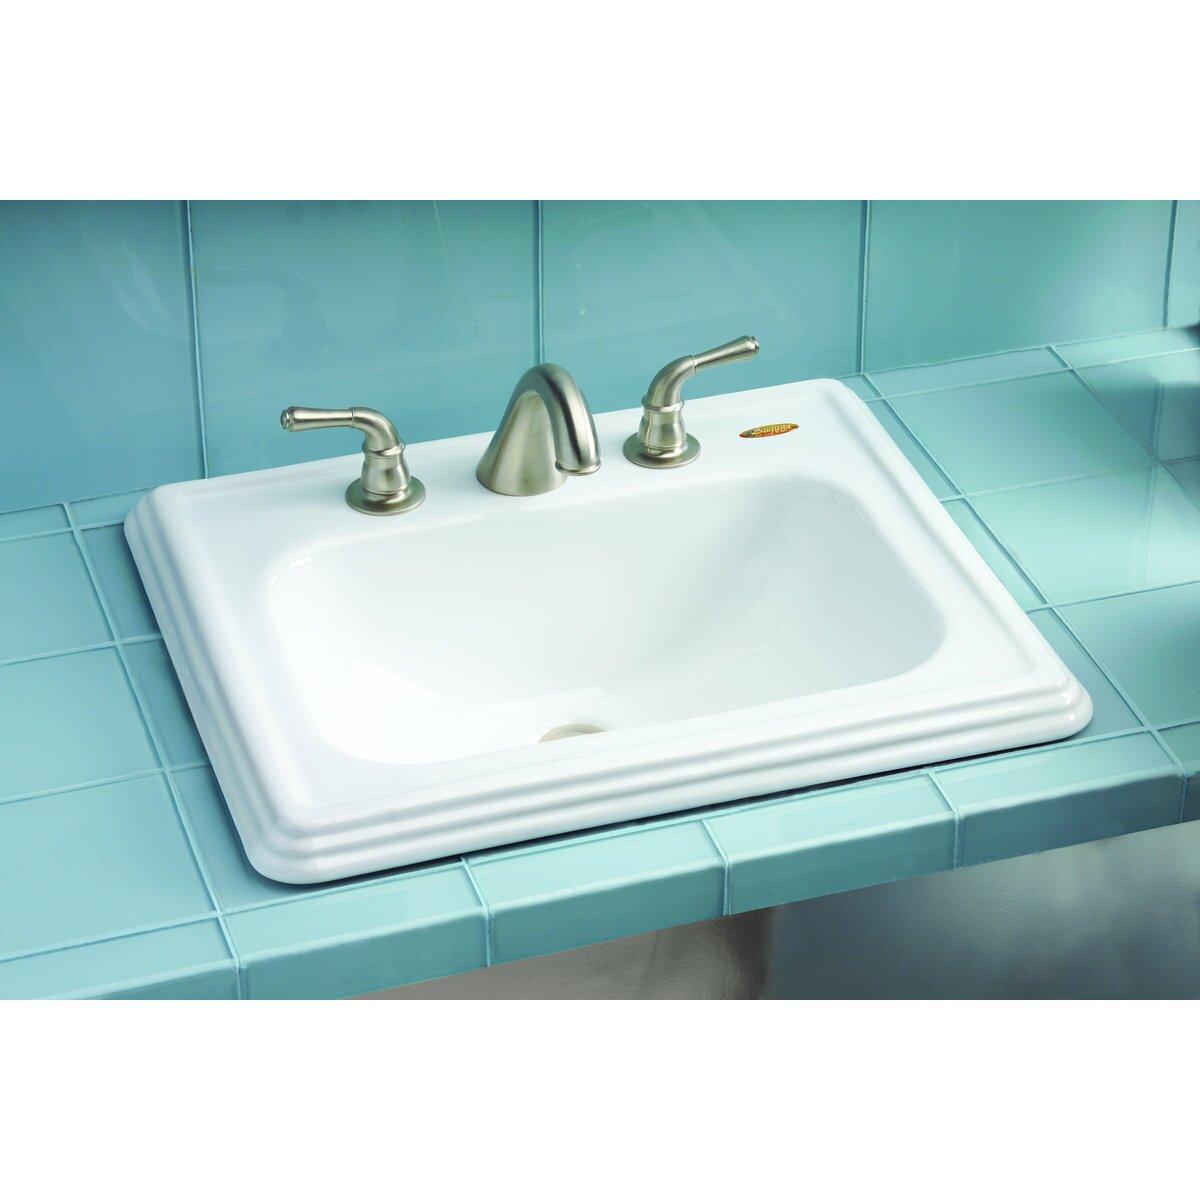 Ada Kitchen Sink: Toto Promenade Self Rimming Bathroom Sink & Reviews